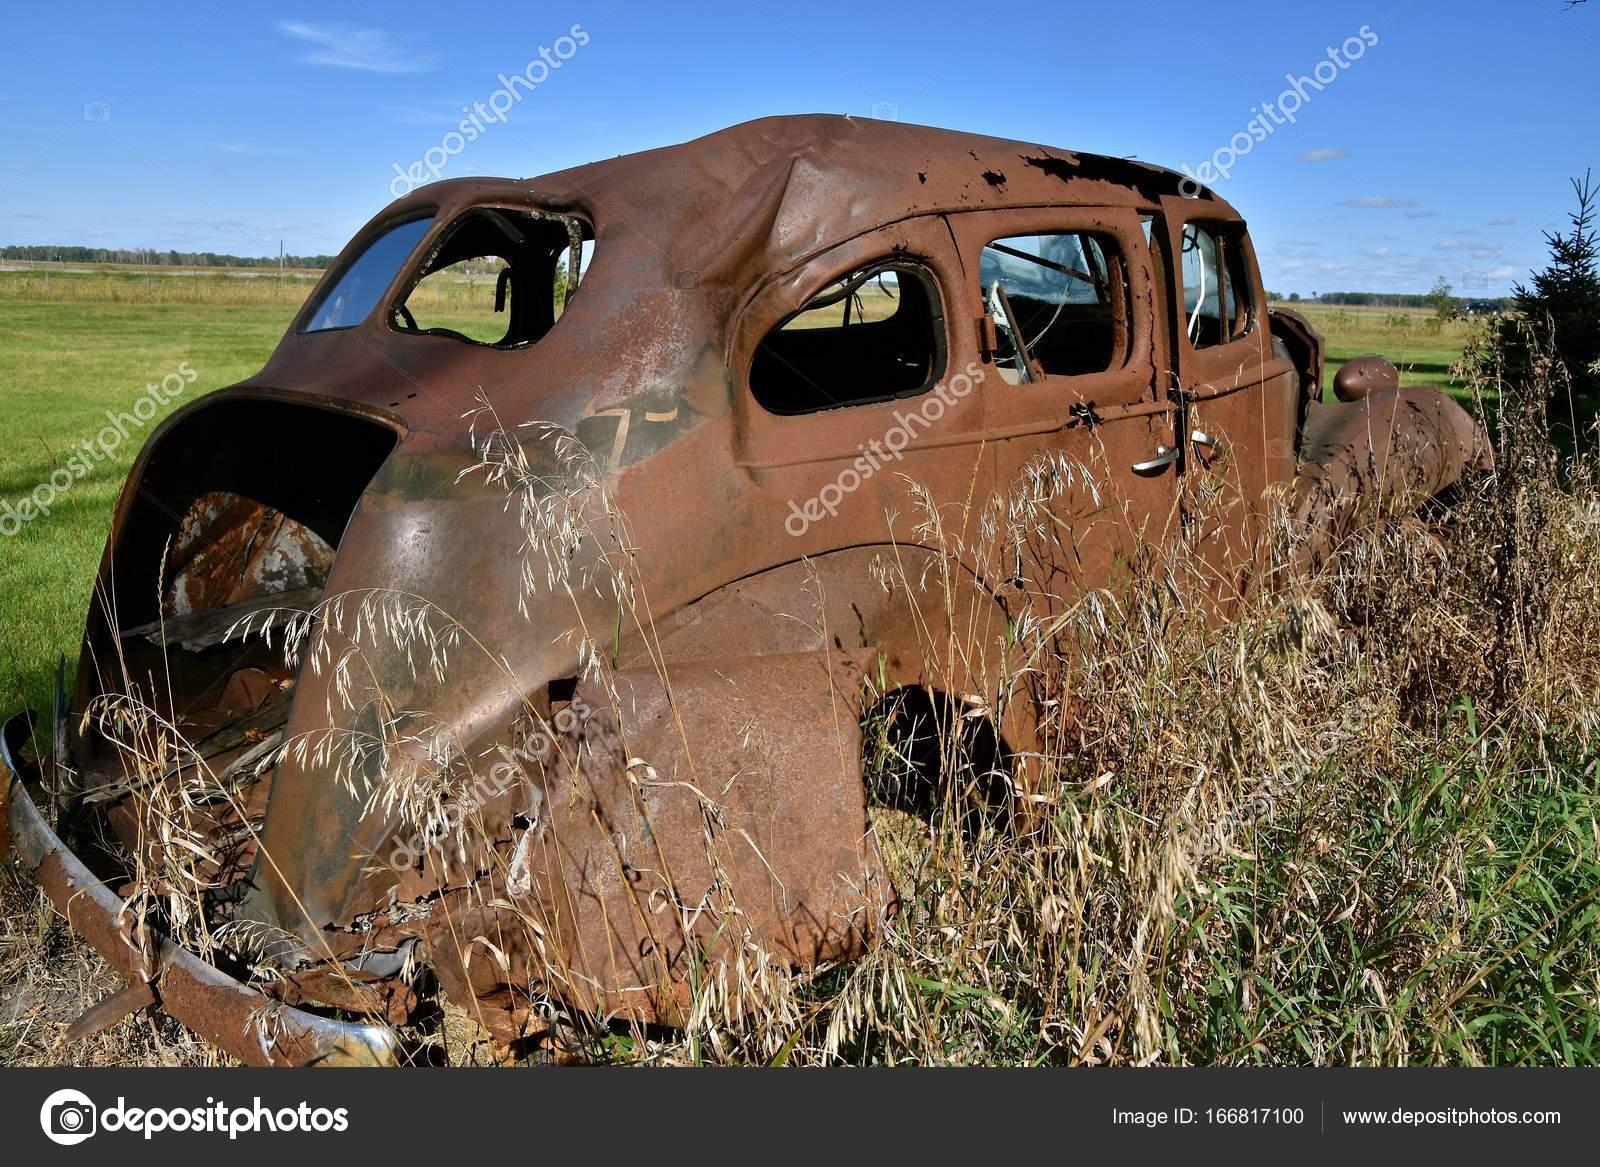 Rostigen alten Auto-Rahmen — Stockfoto © fiskness #166817100